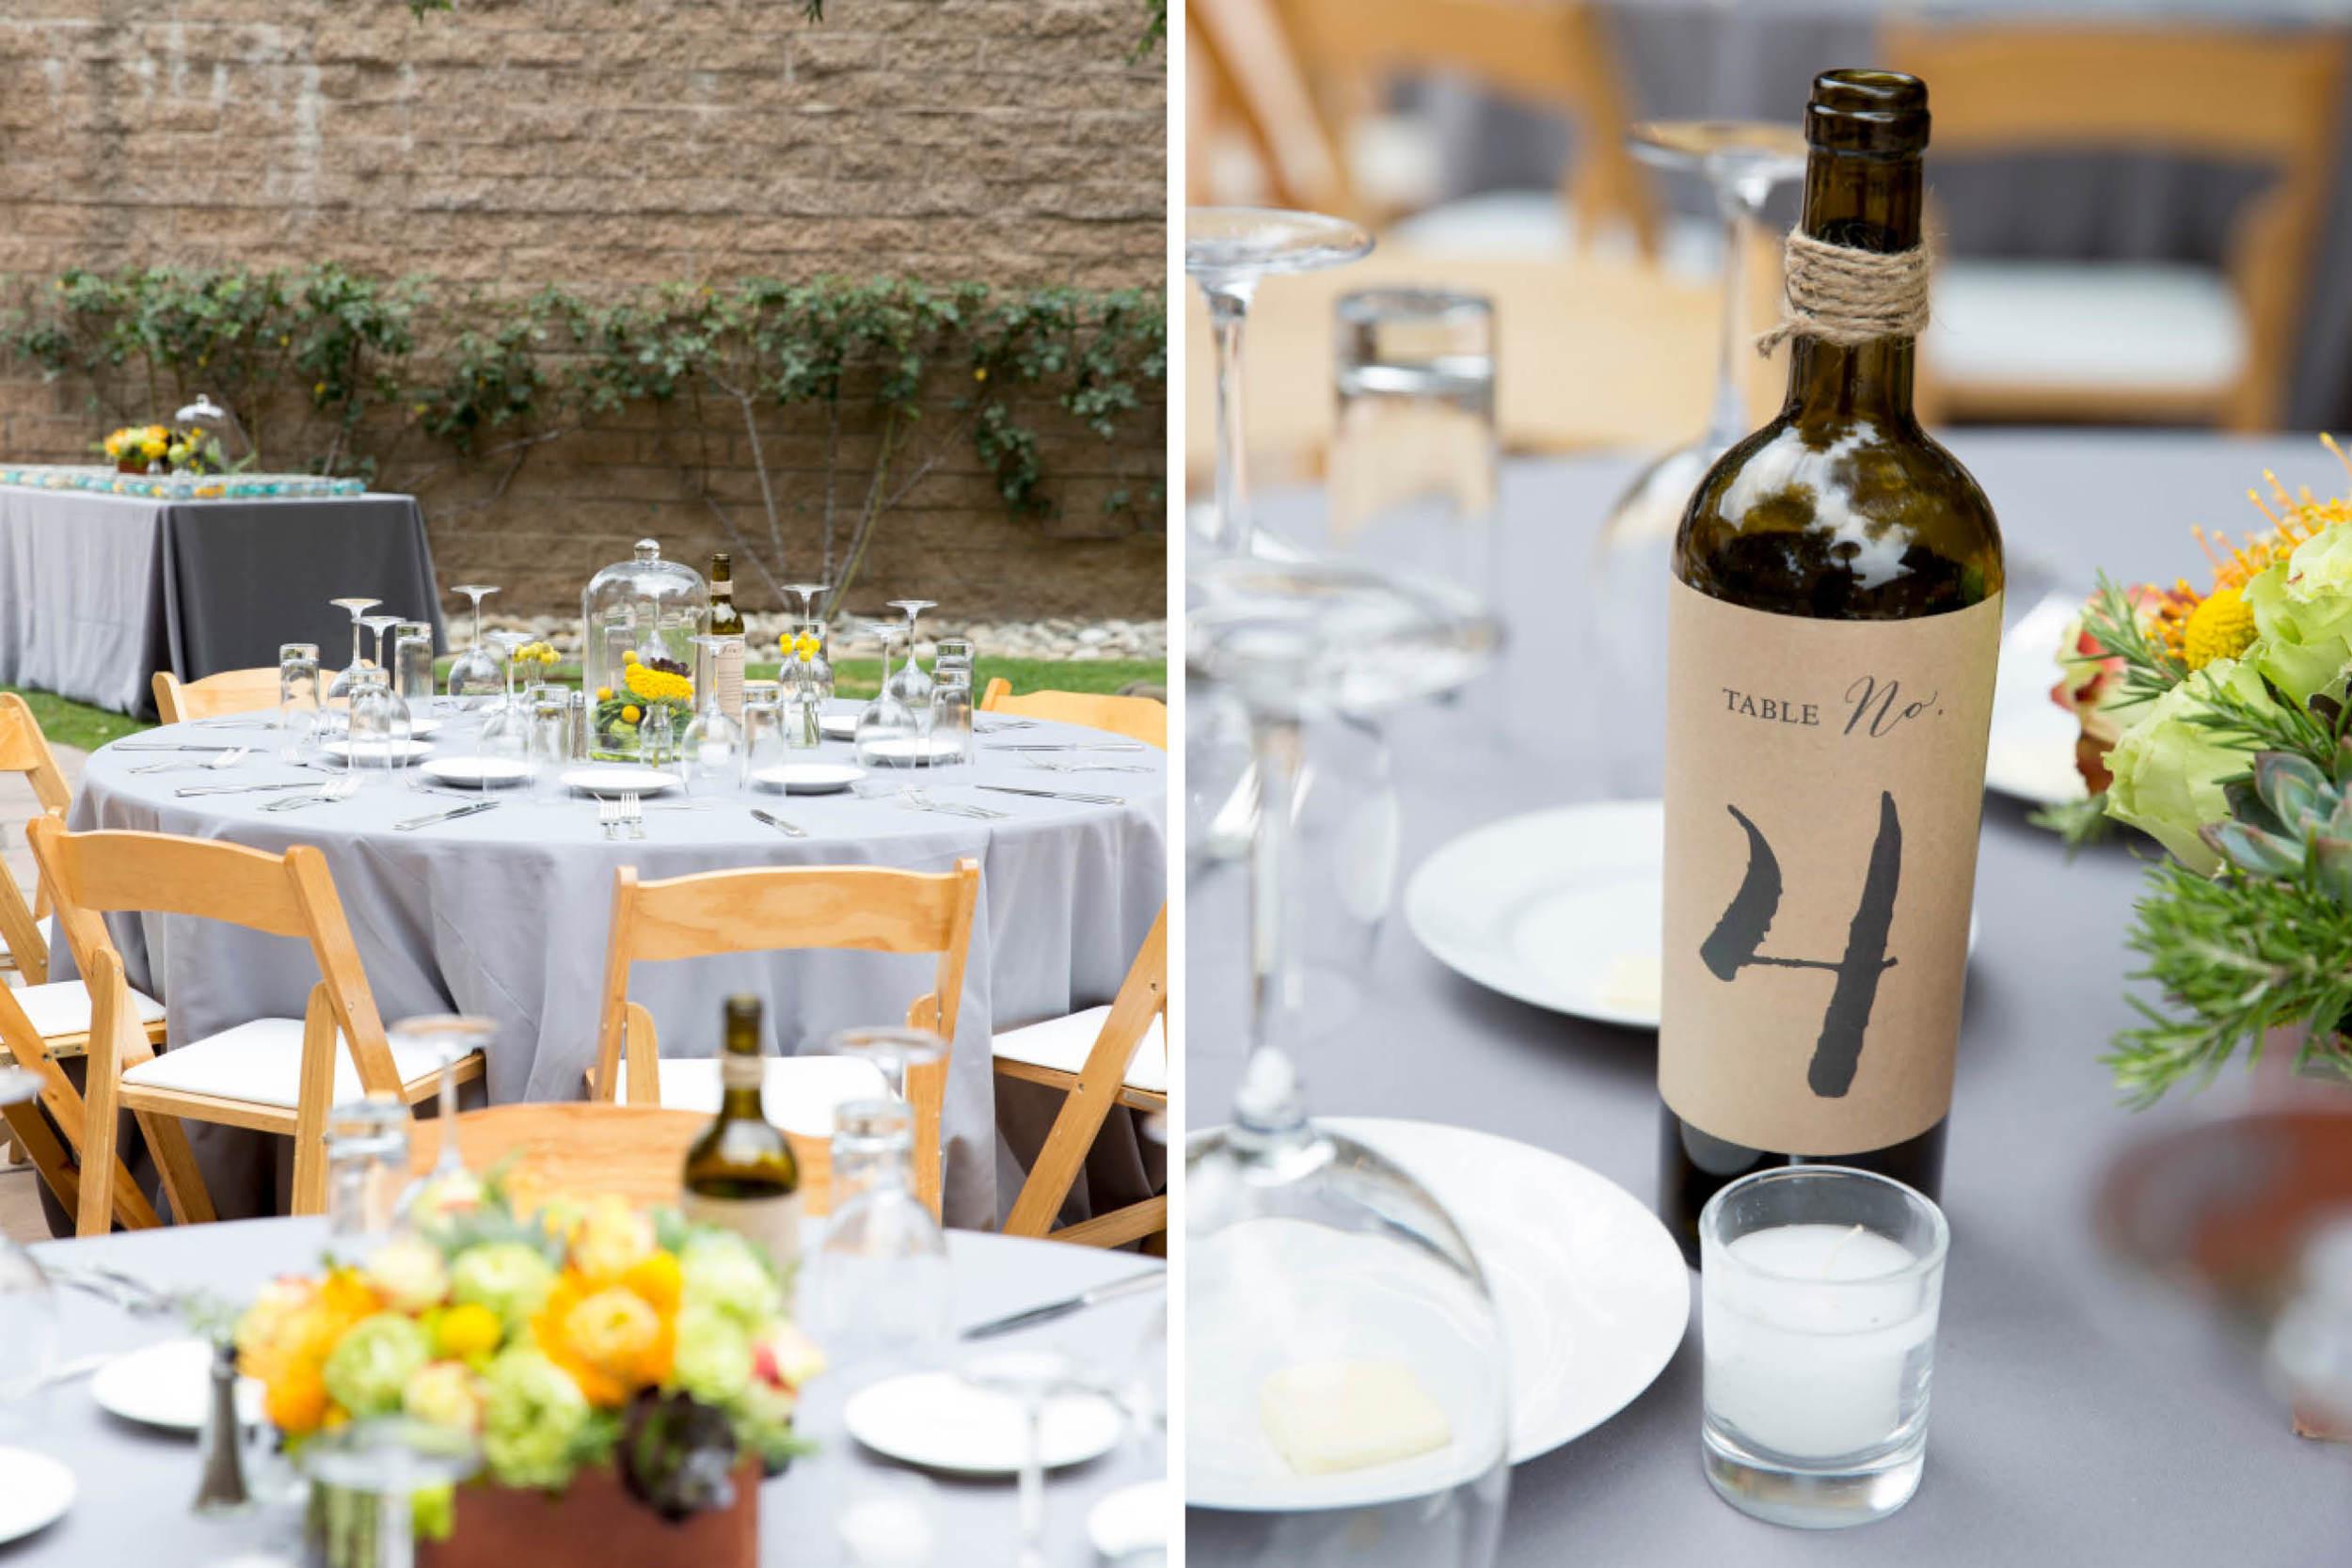 firestone-winery-vineyard-wedding-planner-coordinator-santa-barbara-ynez-los-olivos (25).jpg